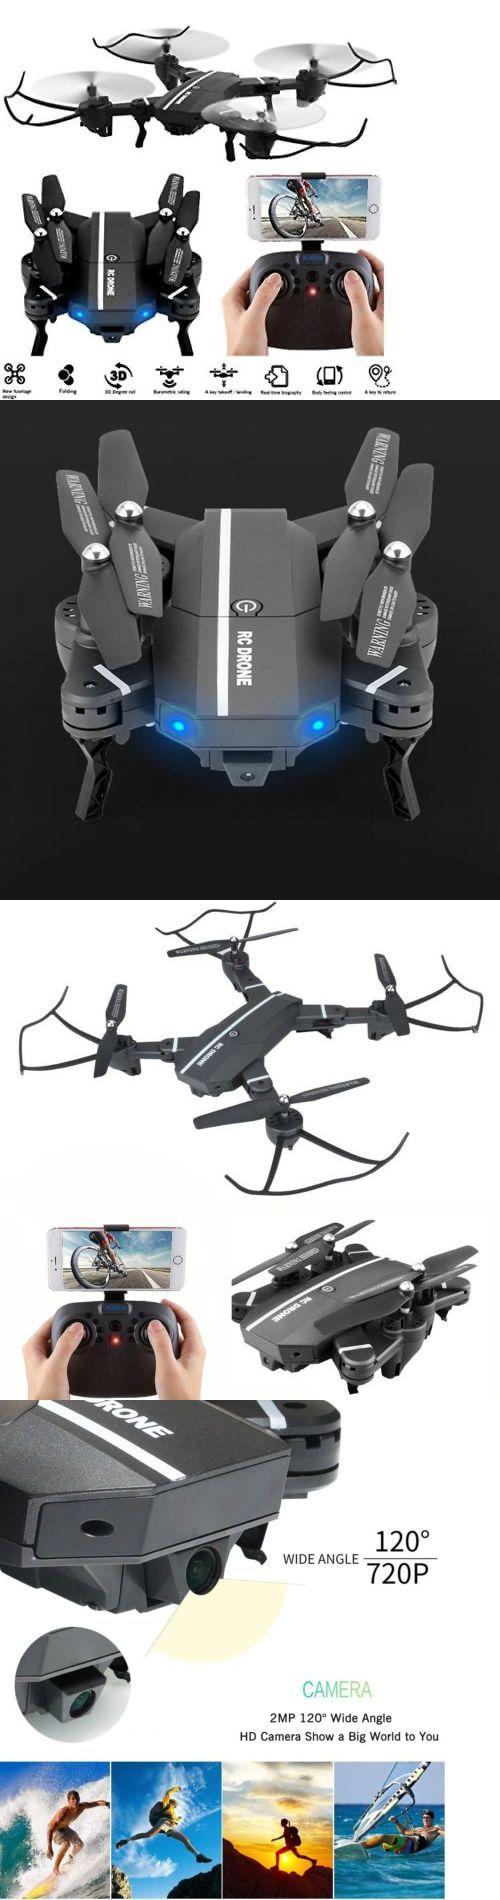 Acheter dronex pro greece drone interieur